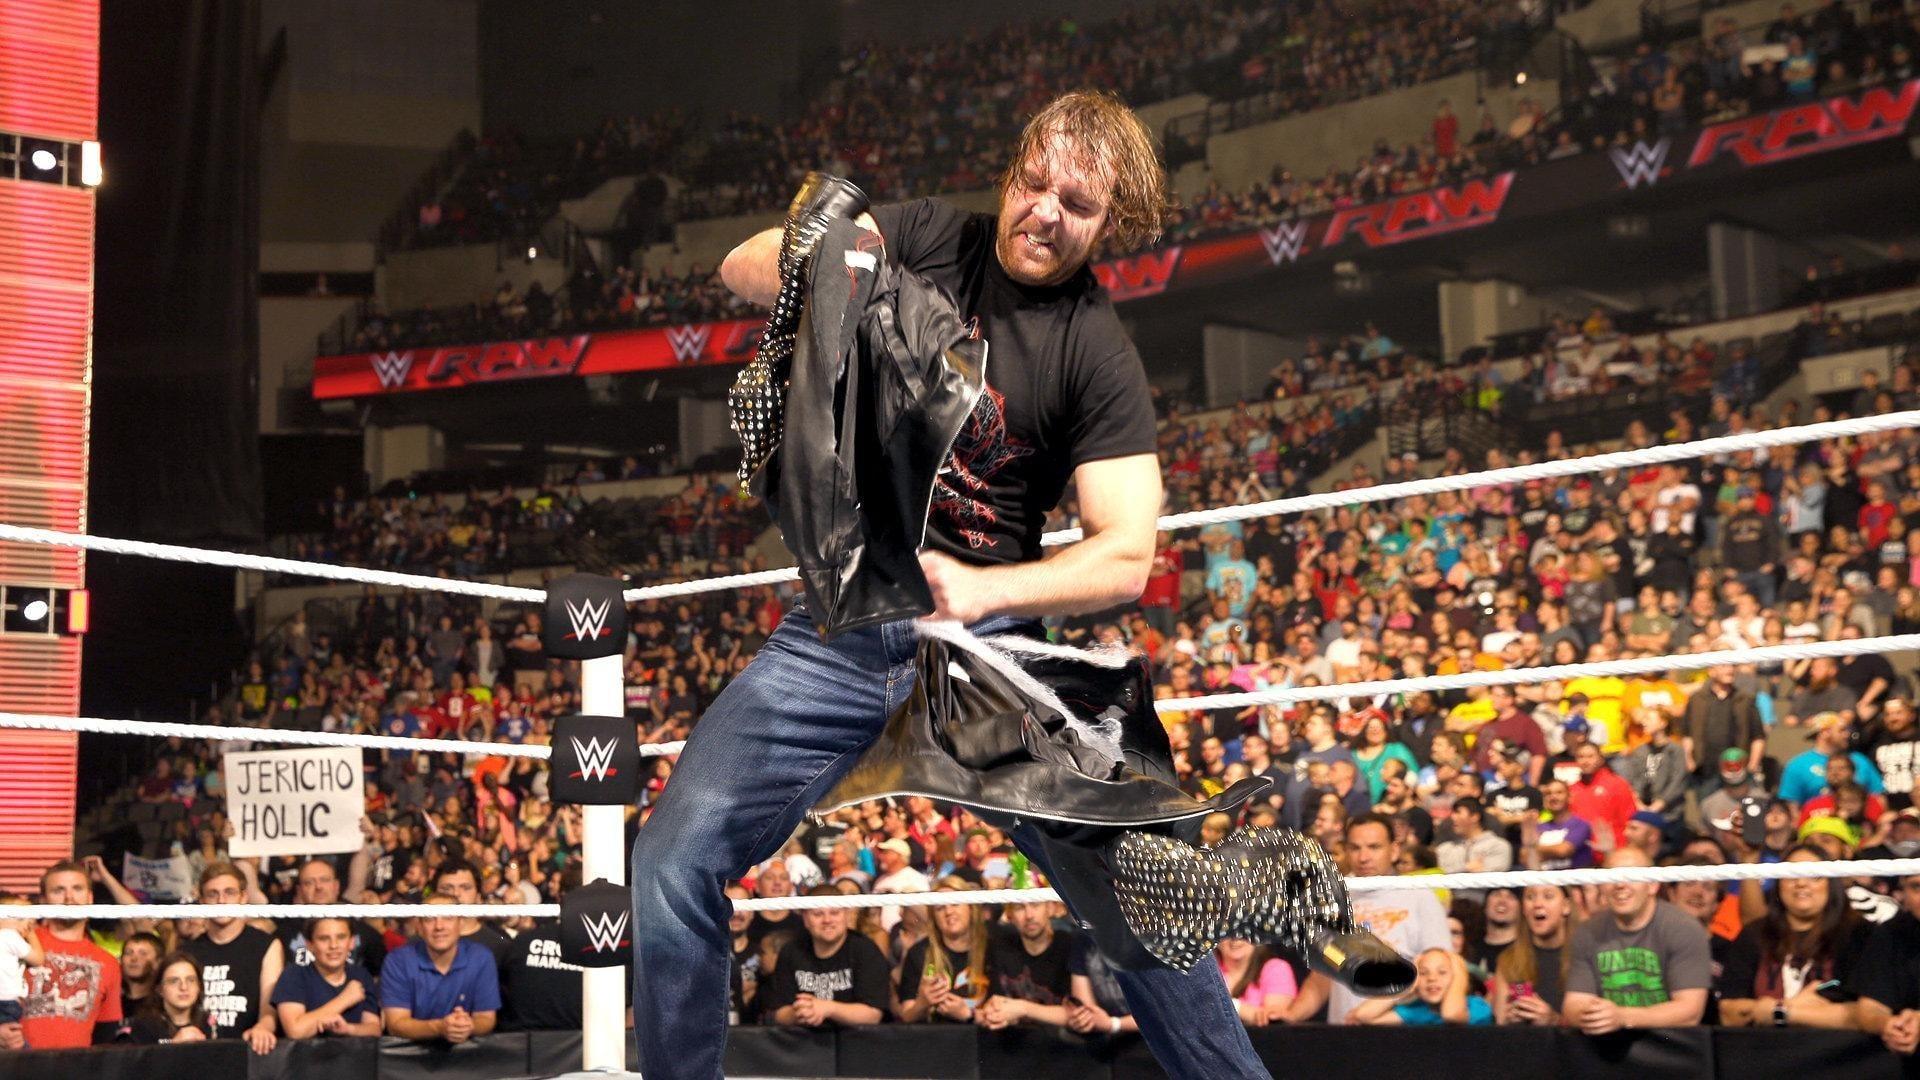 WWE Raw Season 24 :Episode 19  May 9, 2016 (Omaha, NE)